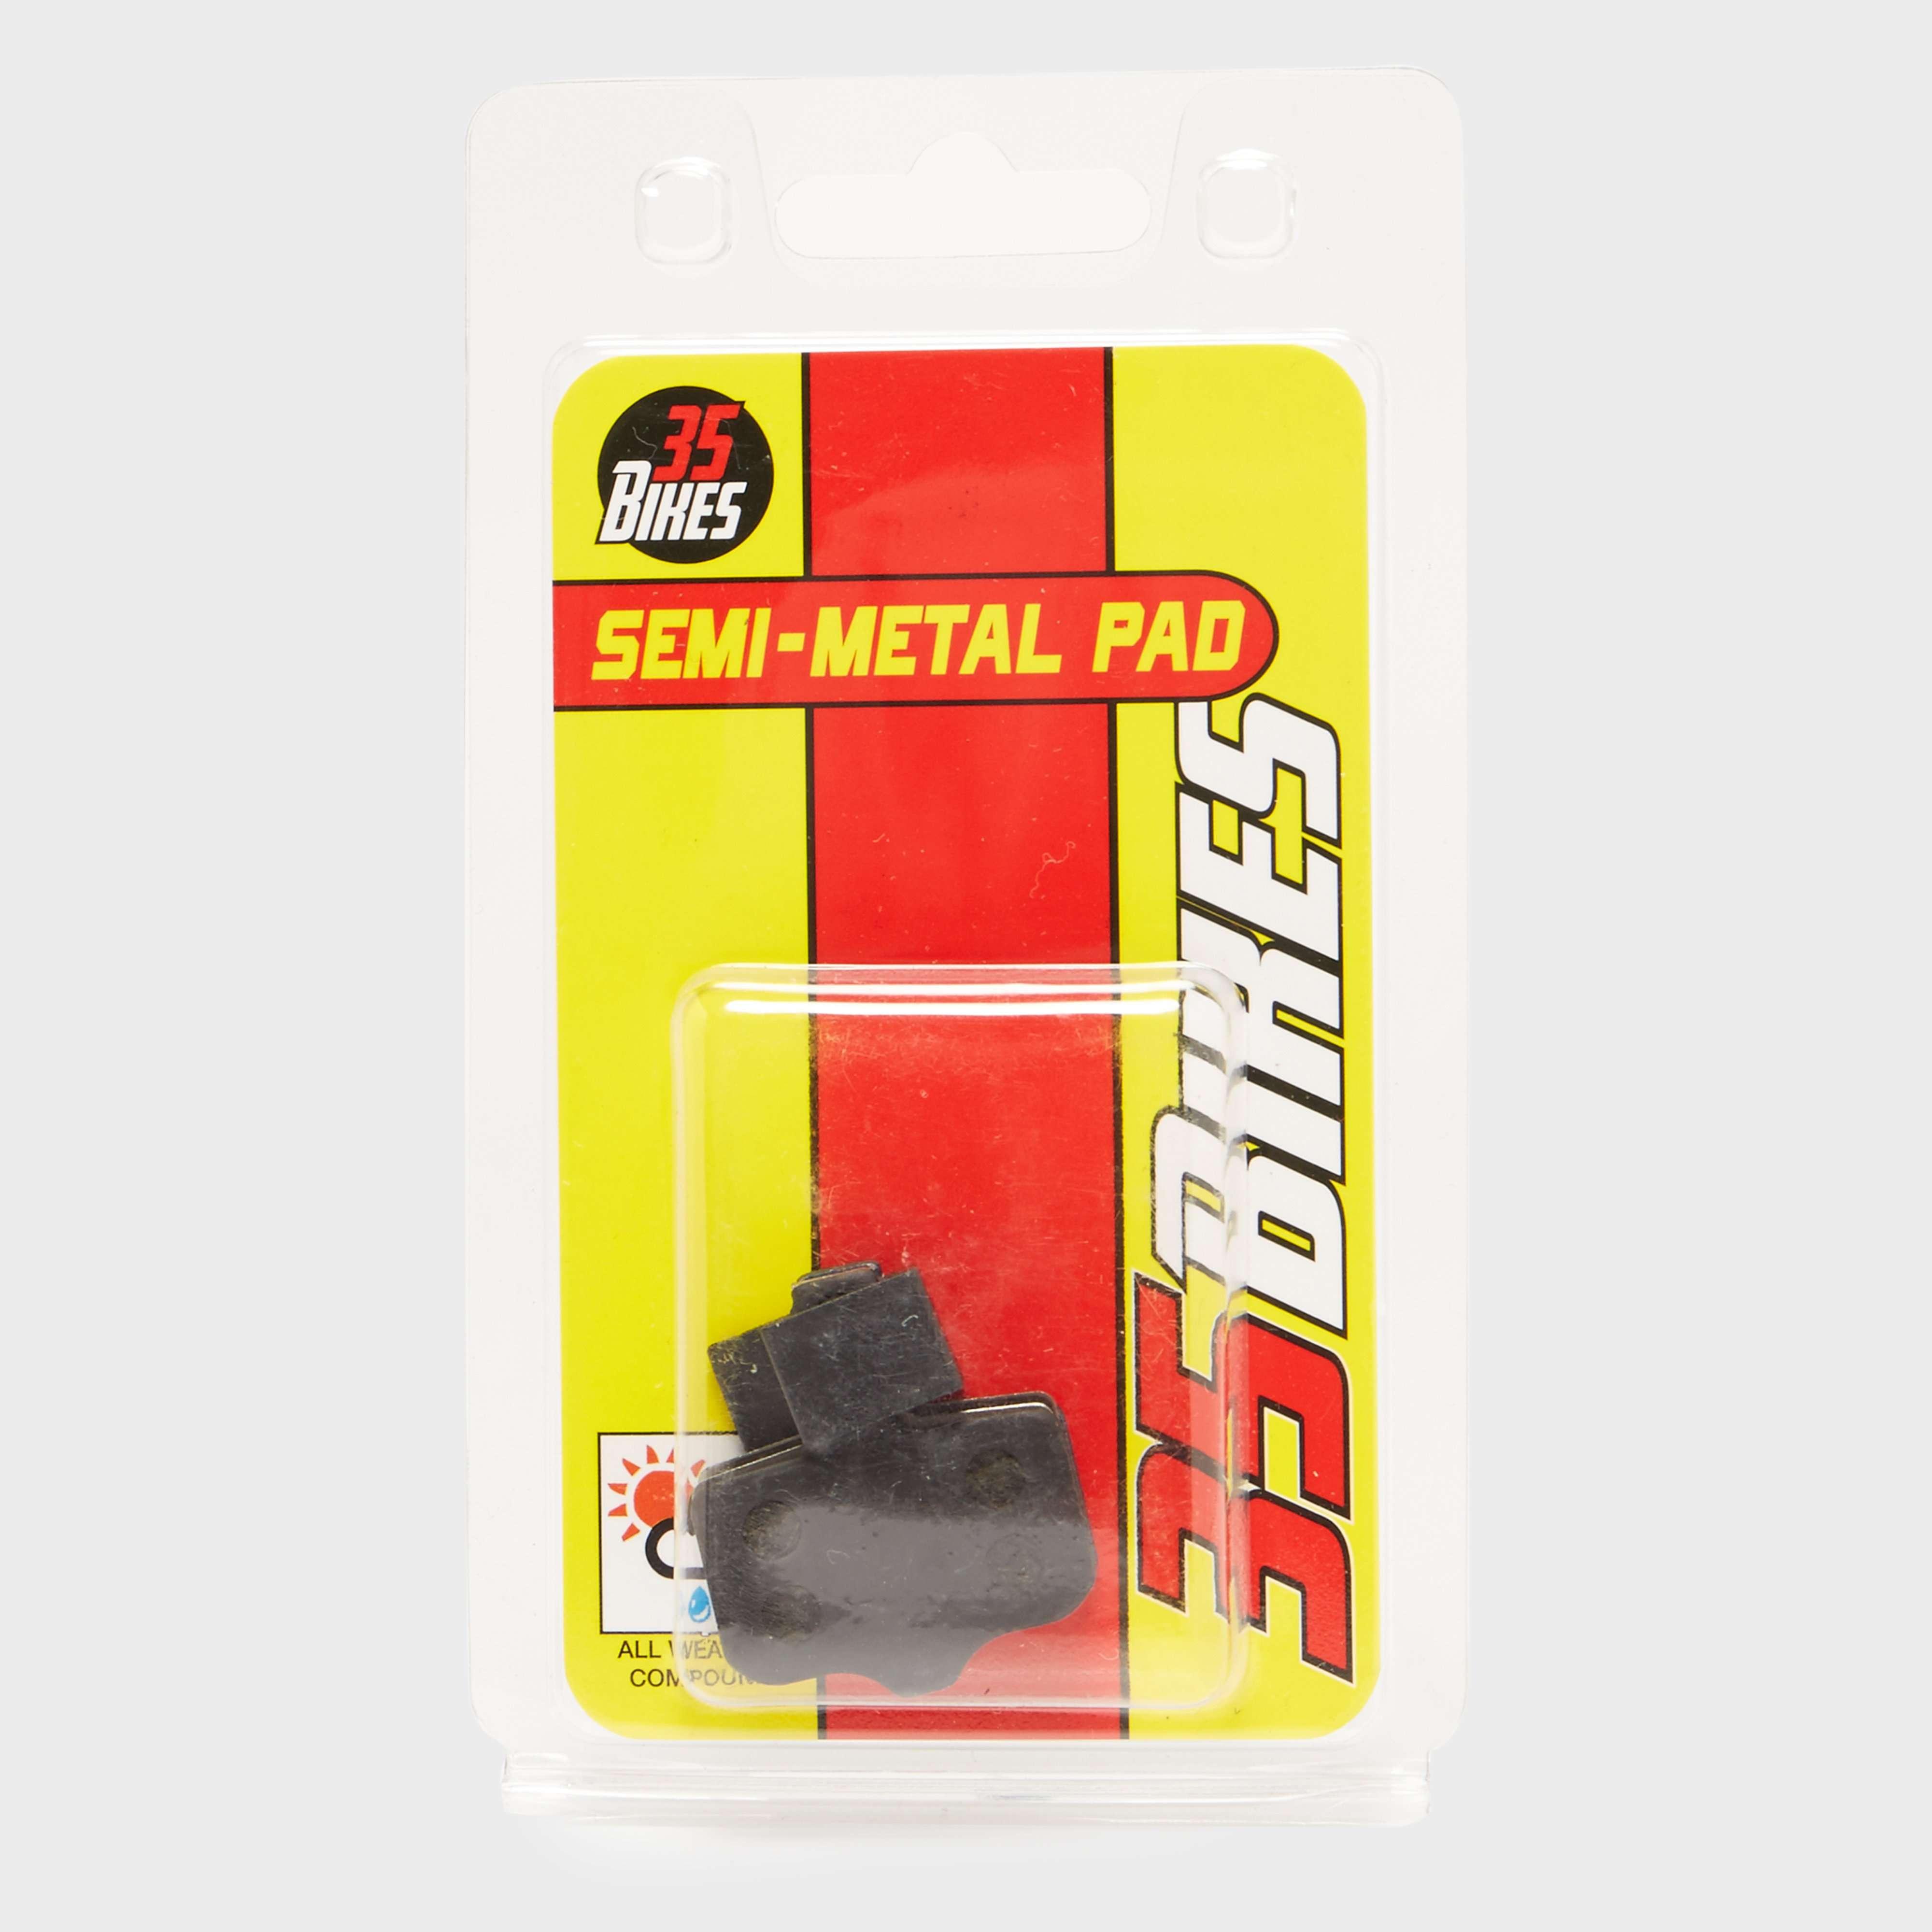 35 BIKES Shimano Avid, Elixir, SRAM X0/XX Semi Metallic Brake Pads